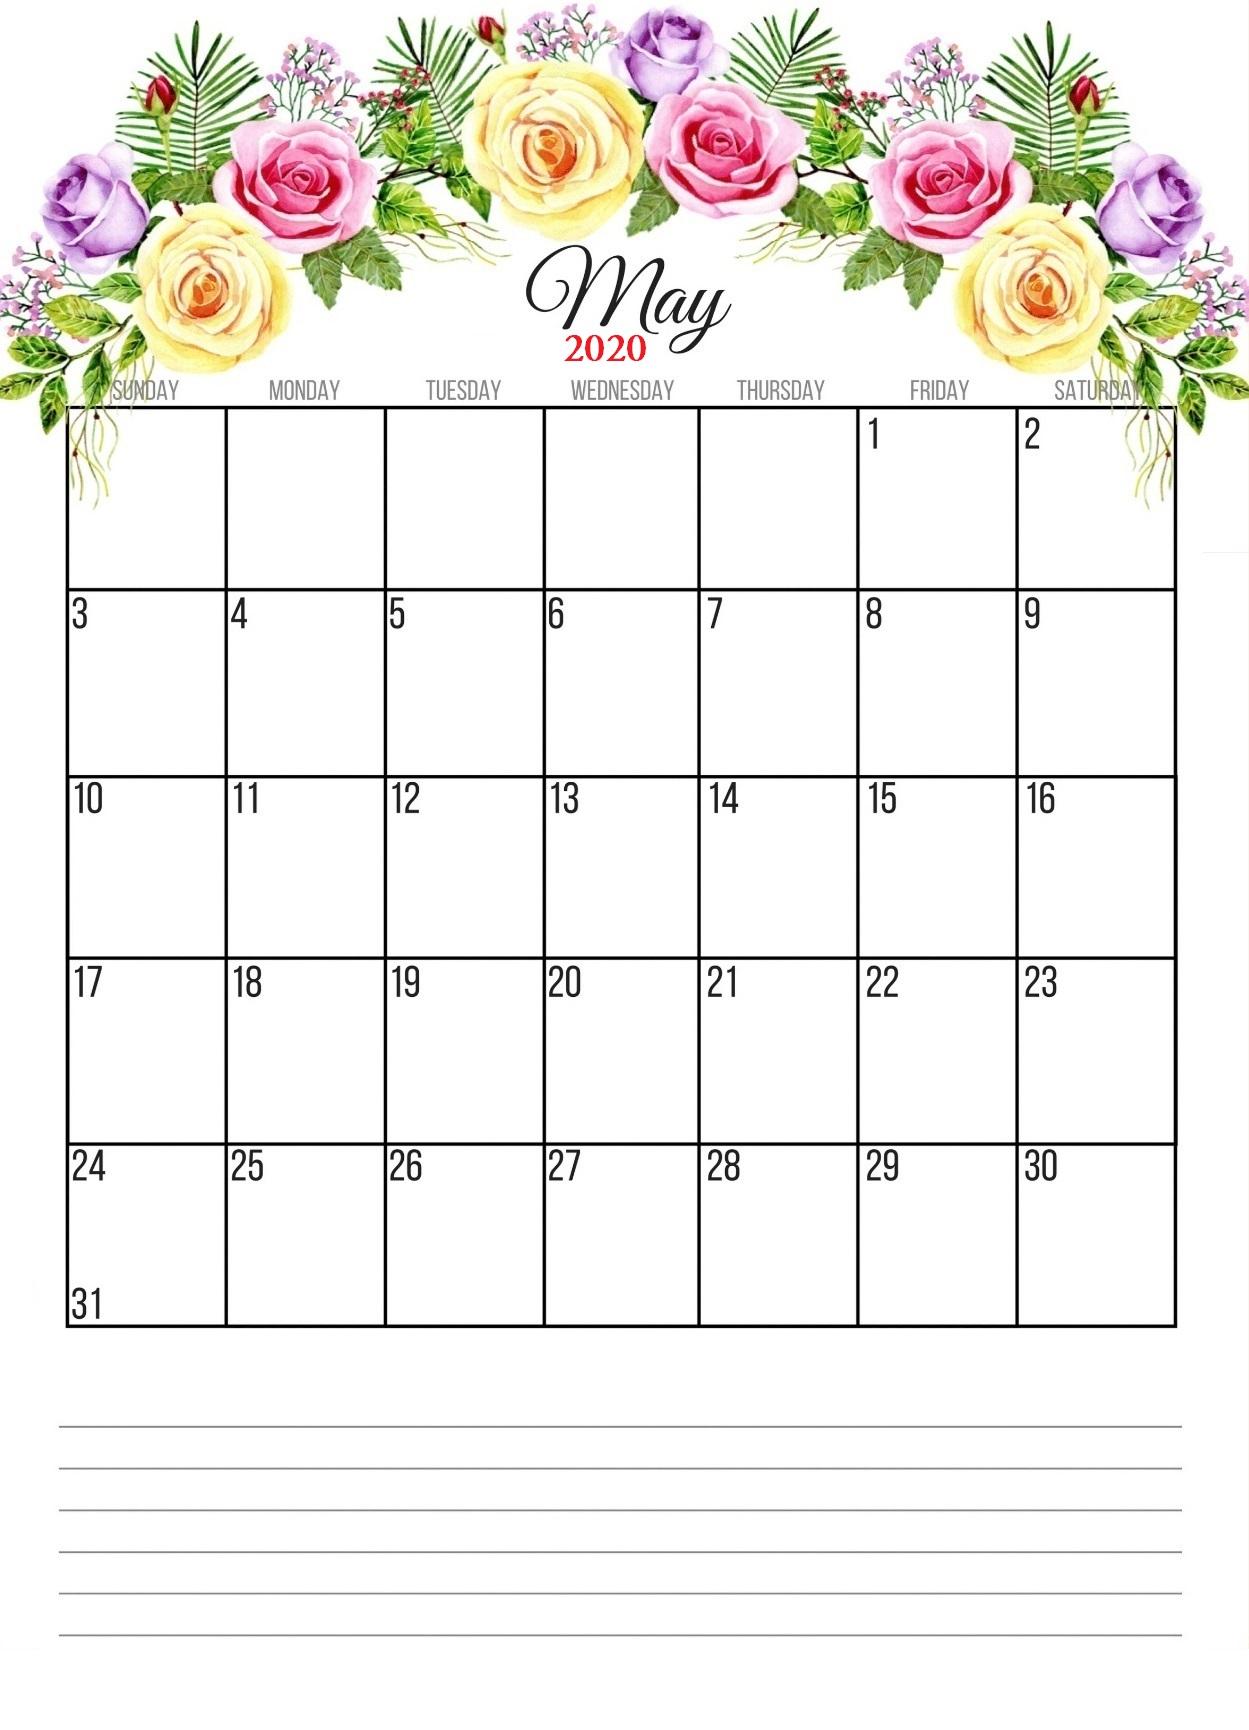 May 2020 Floral Calendar